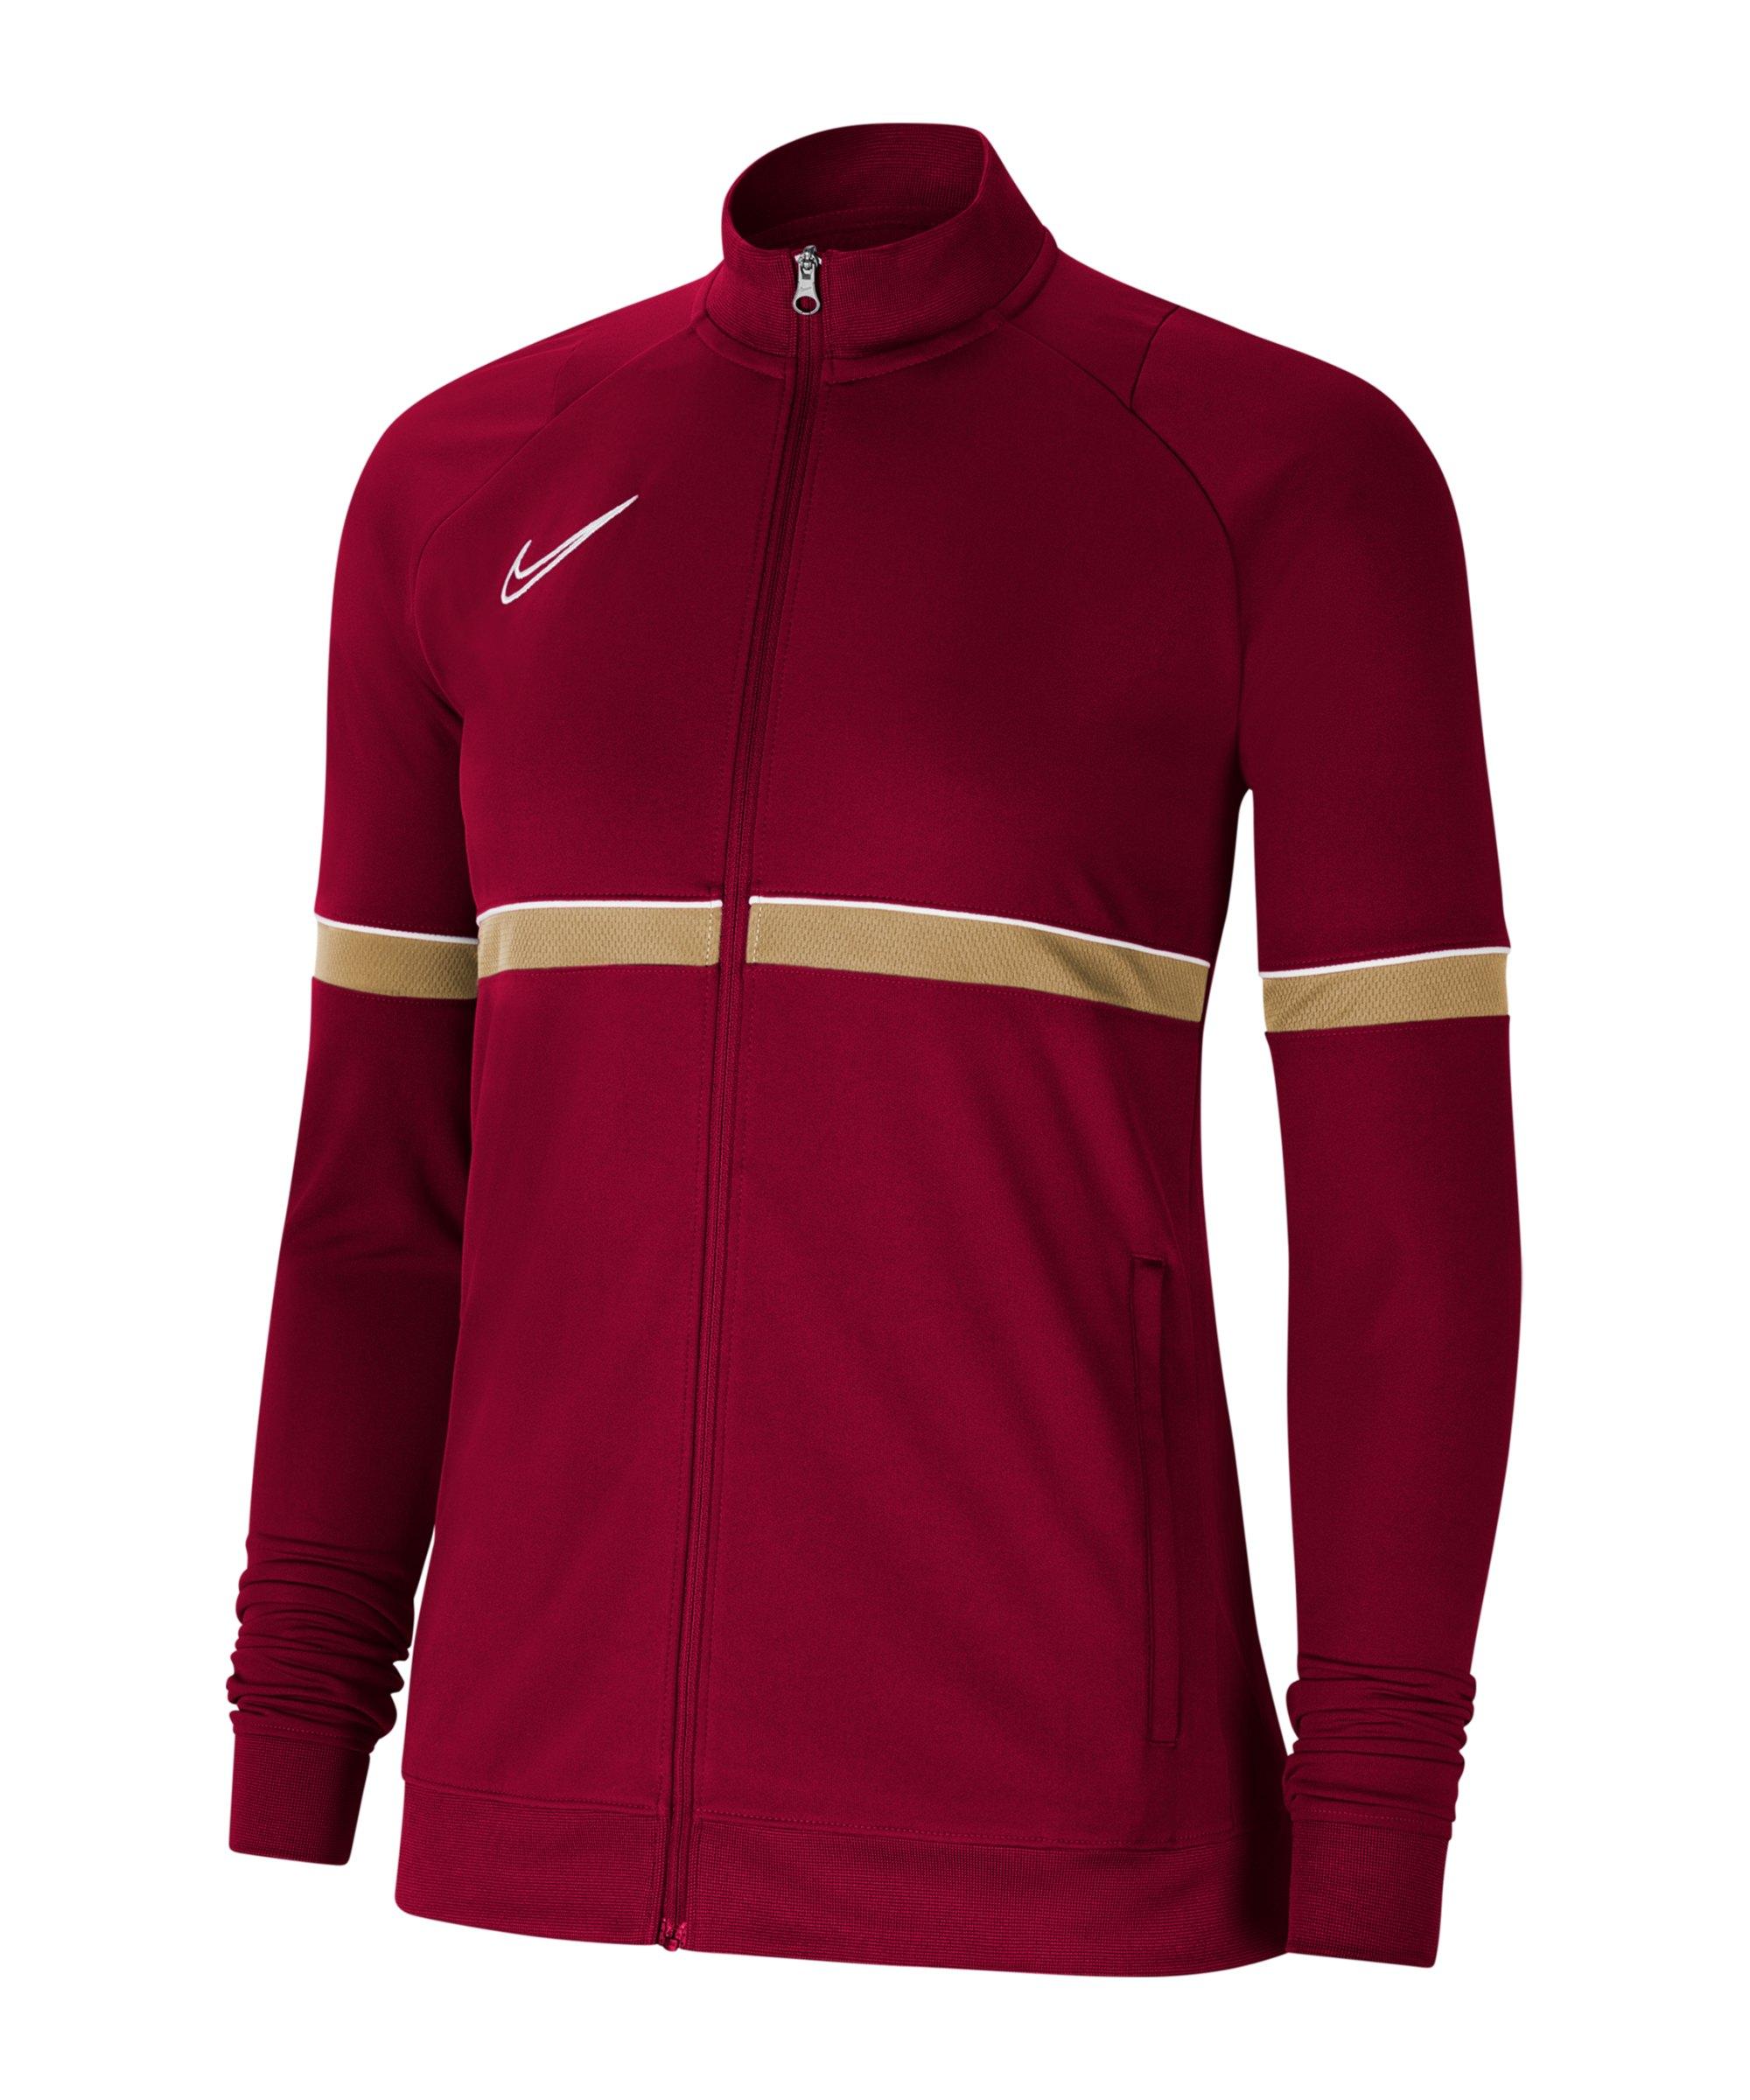 Nike Academy 21 Trainingsjacke Damen Rot F677 - rot